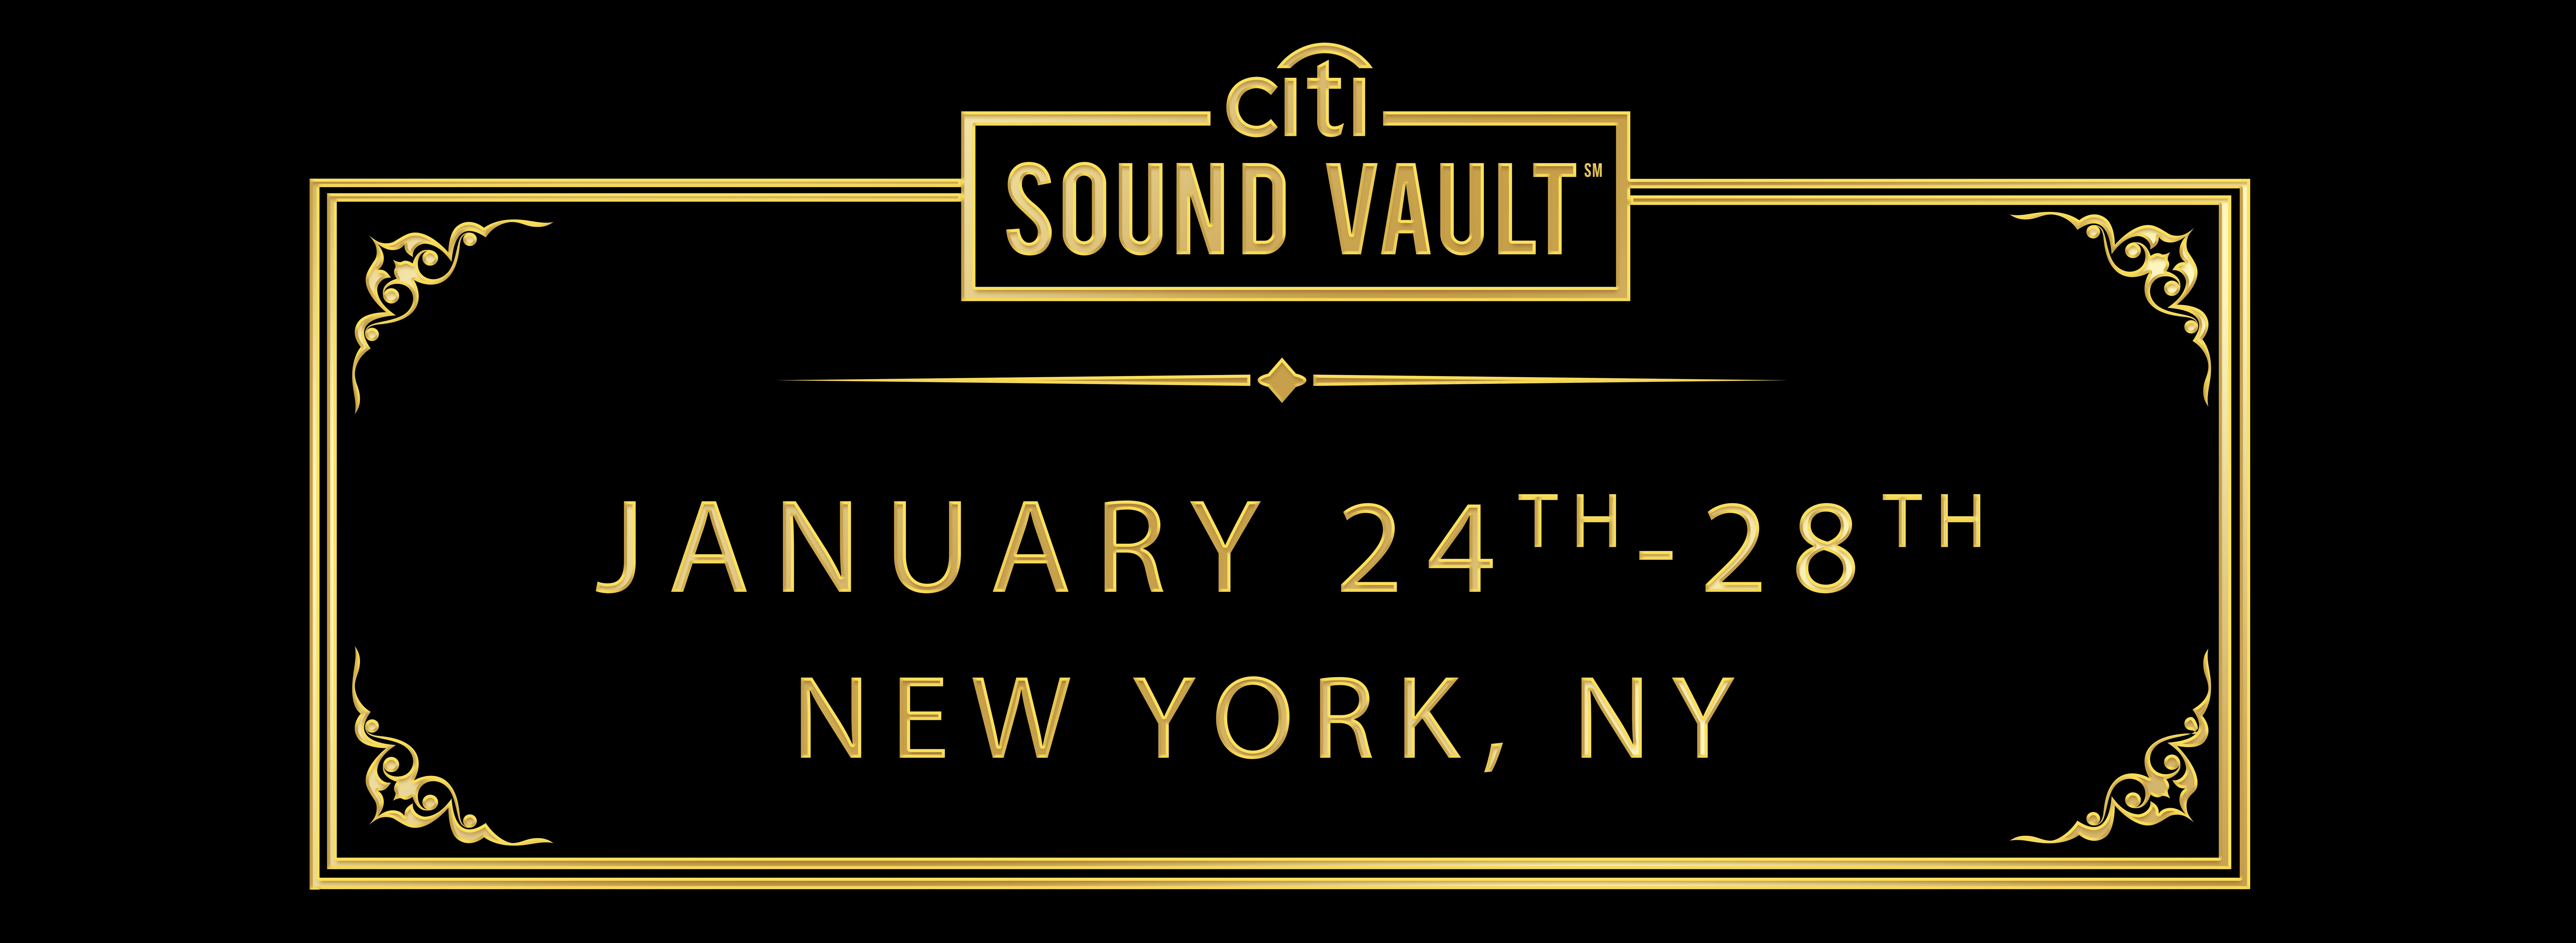 Citi Sound Vault powered by Verified Fan FAQ